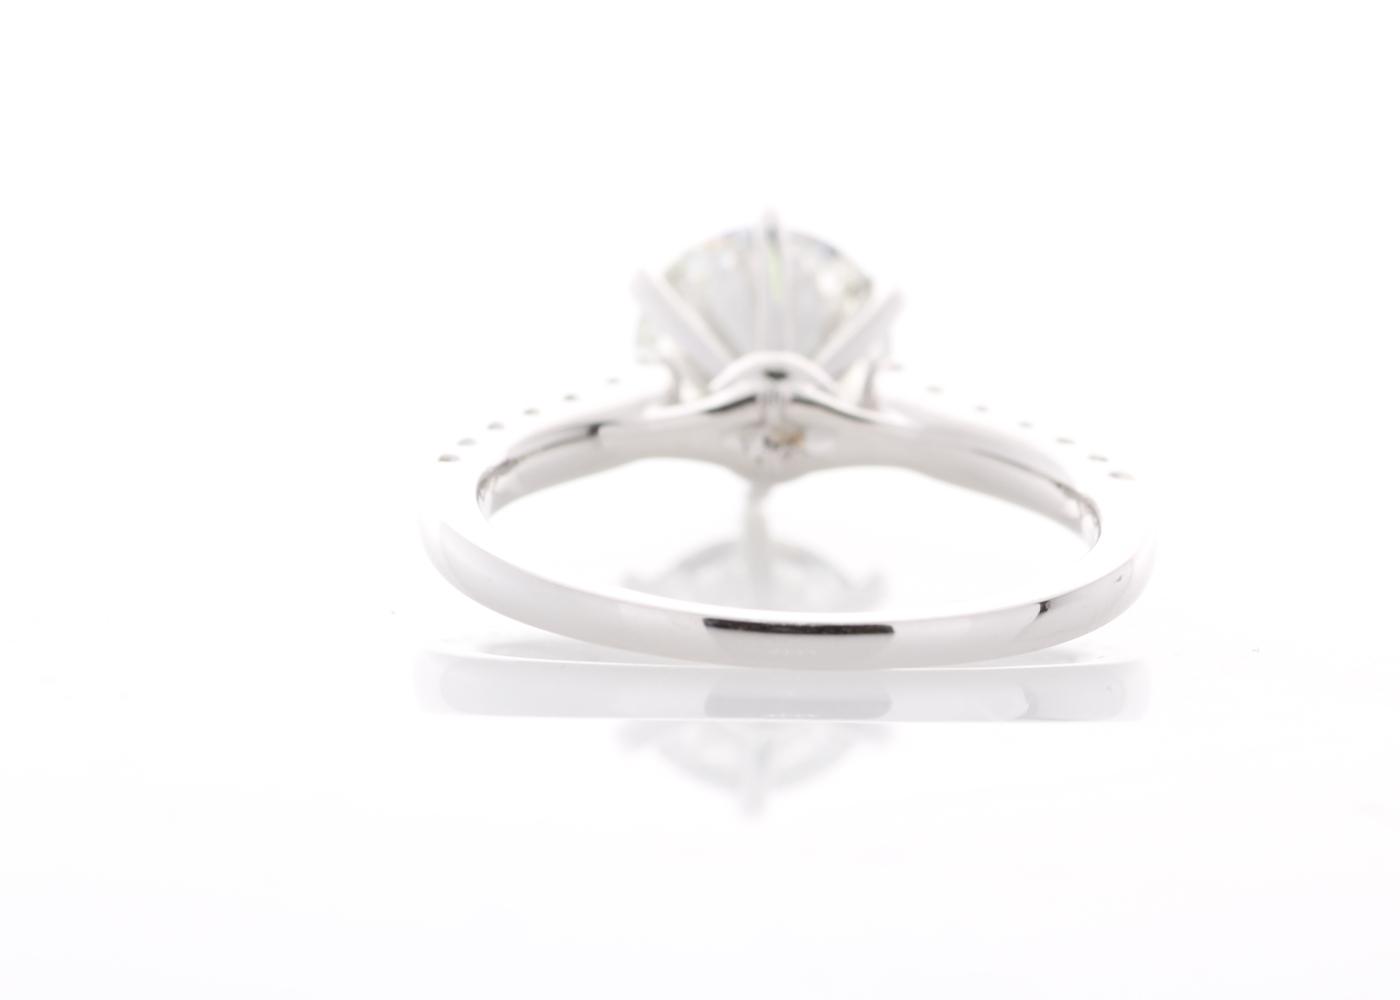 Lot 22 - 18ct White Gold Single Stone Prong Set With Stone Set Shoulders Diamond Ring (1.56) 1.85 Carats